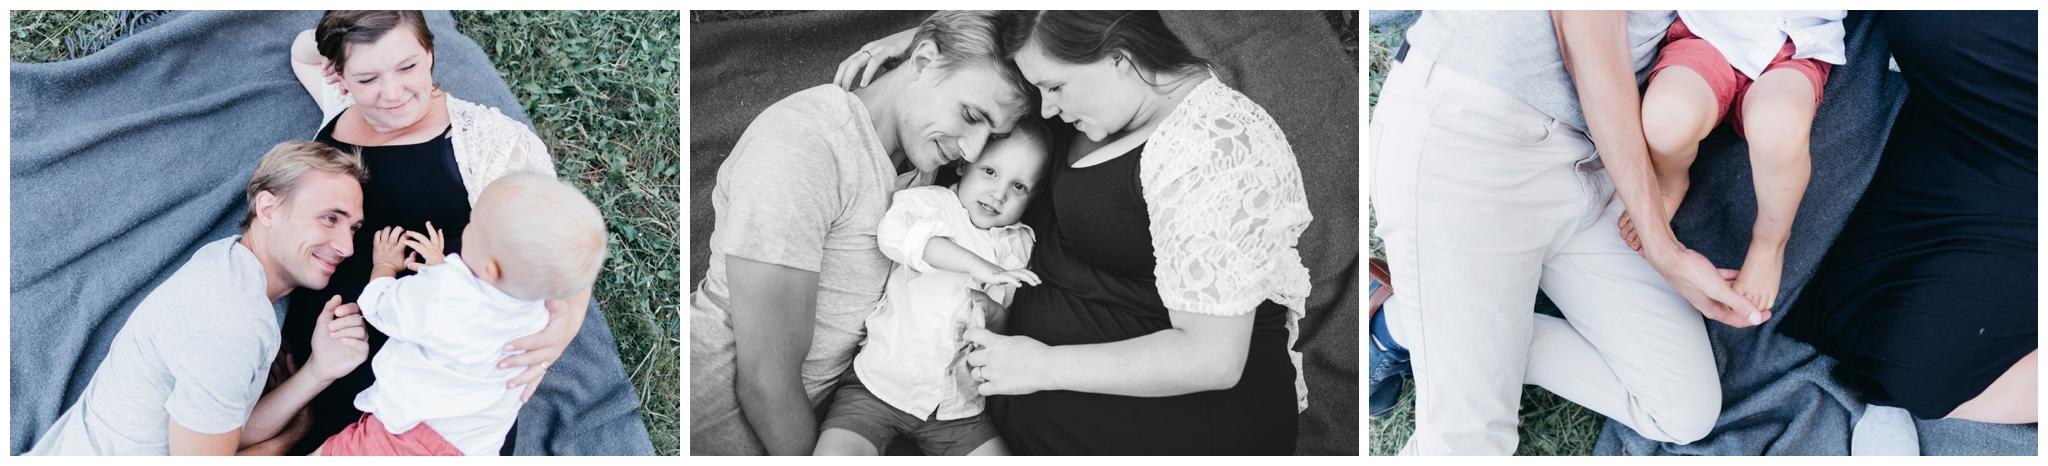 familjefotograf stockholm, familjefotografering vallentuna, familjefotograf täby, barnfotograf stockholm, familjebilder, familjefotografering stockholm, linda rehlin, cecilia pihl